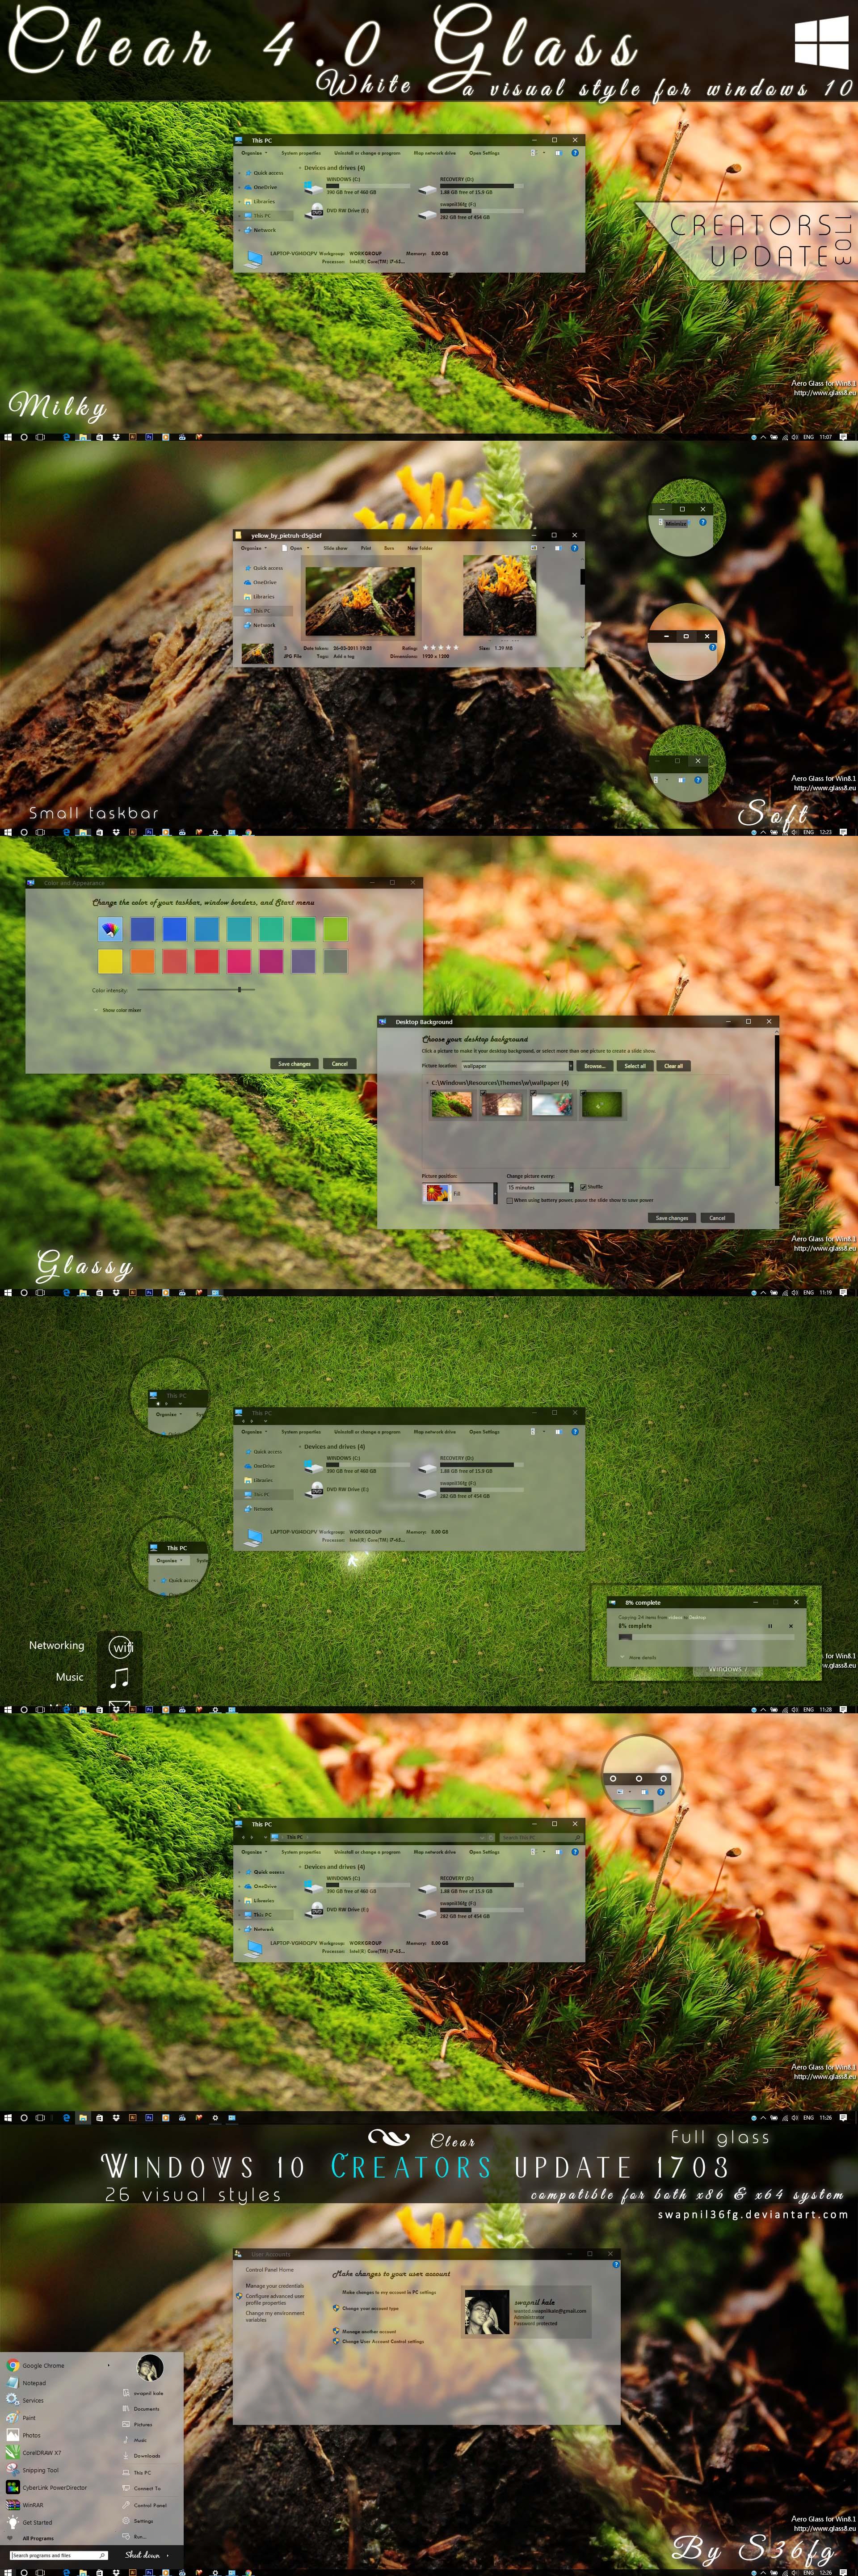 Clear 4.0 glass  for windows 10 creators update